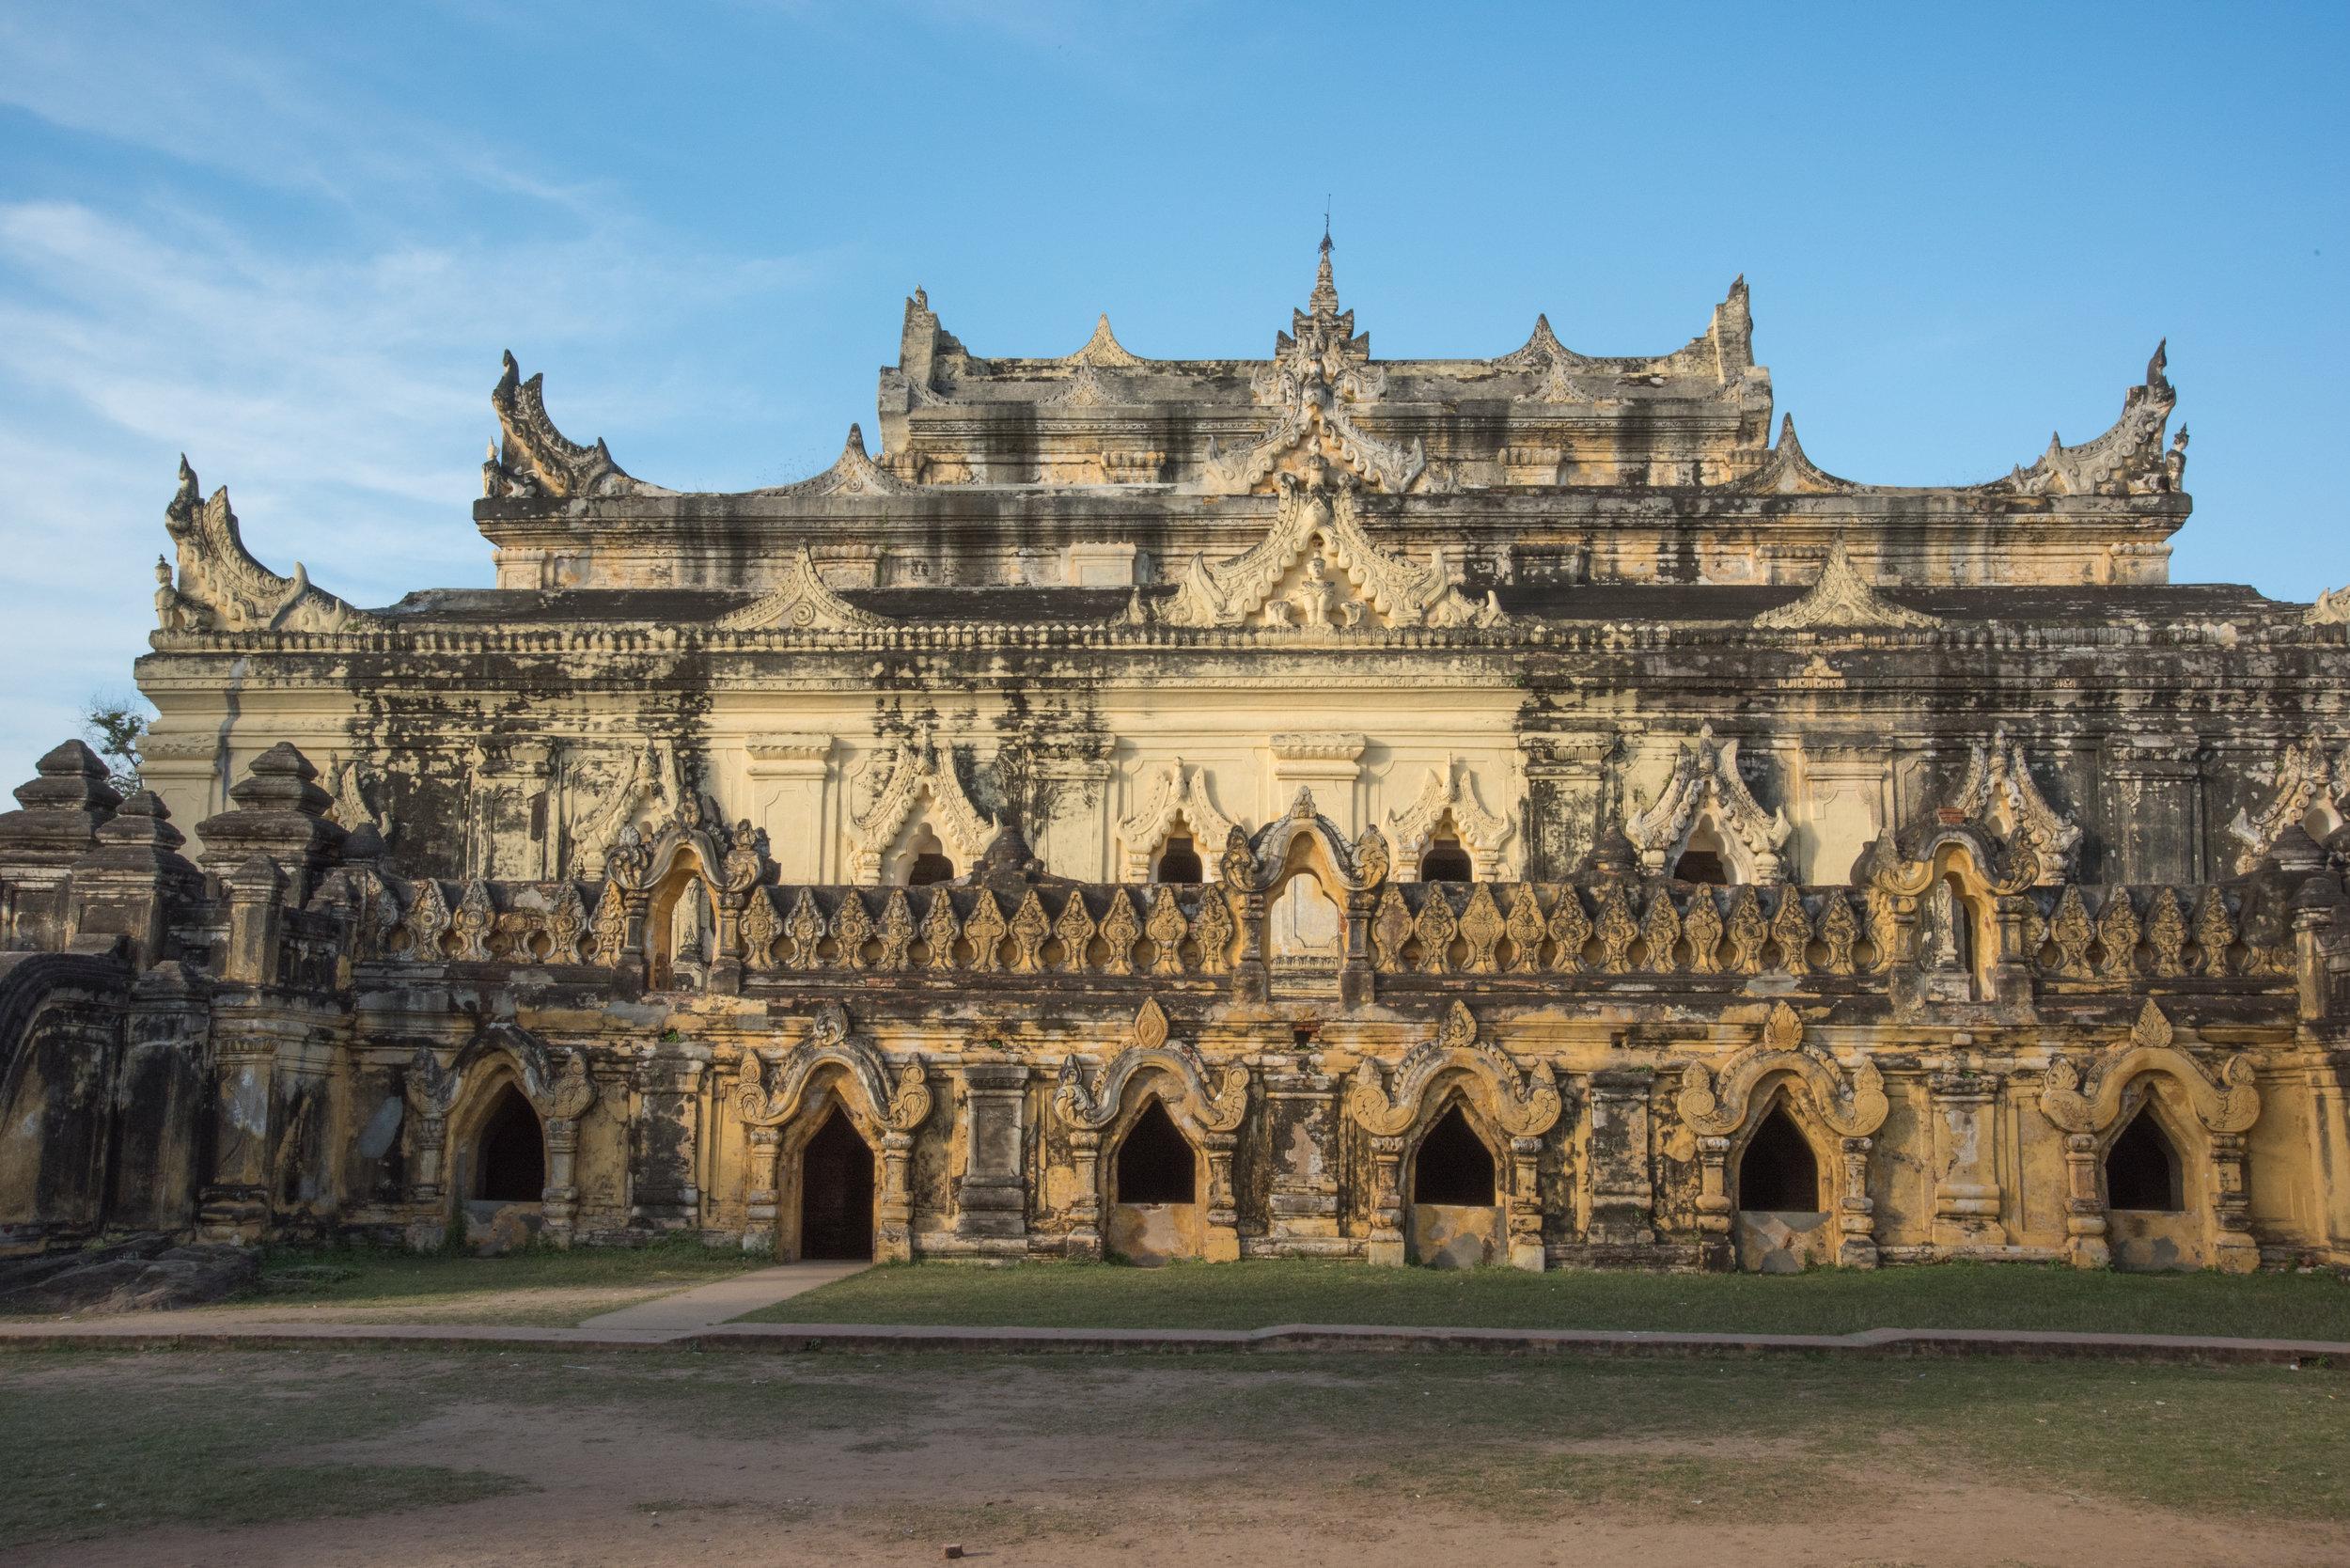 Maha Aung Mye Bom San Brick Monastery, Inwa, Mandalay Region, Myanmar